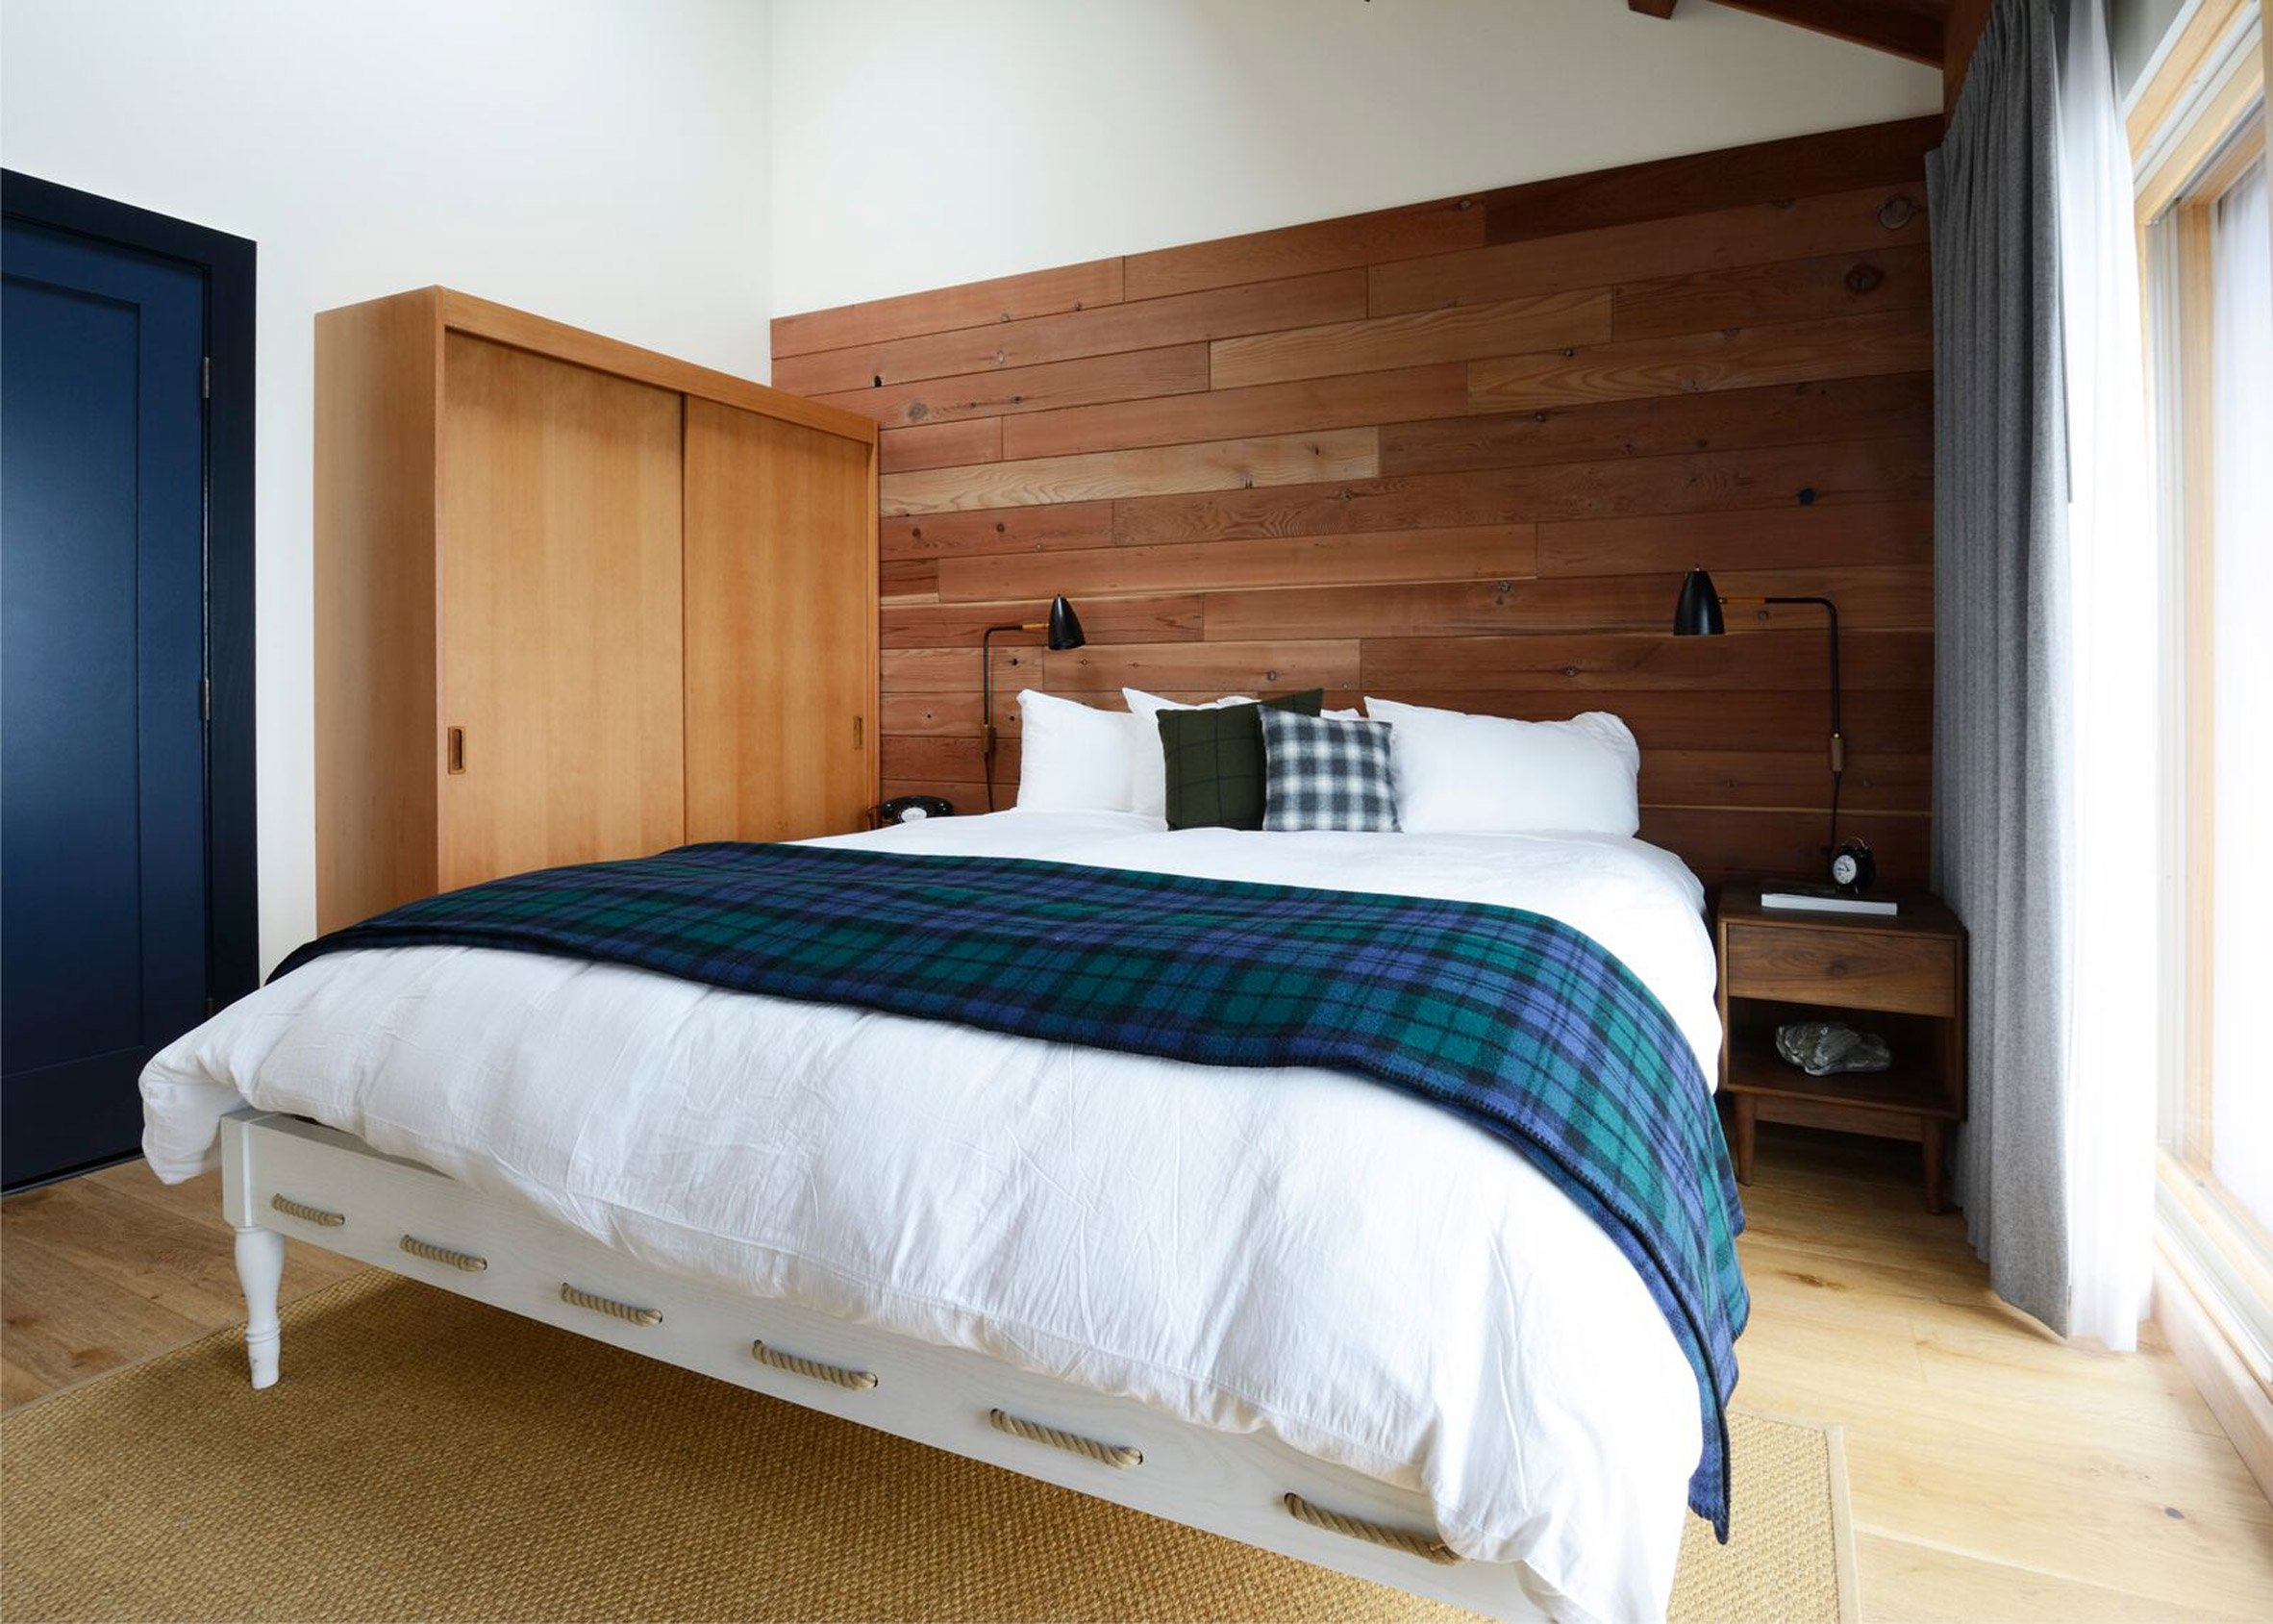 Timber Cove Resort by The Novogratz and Gensler